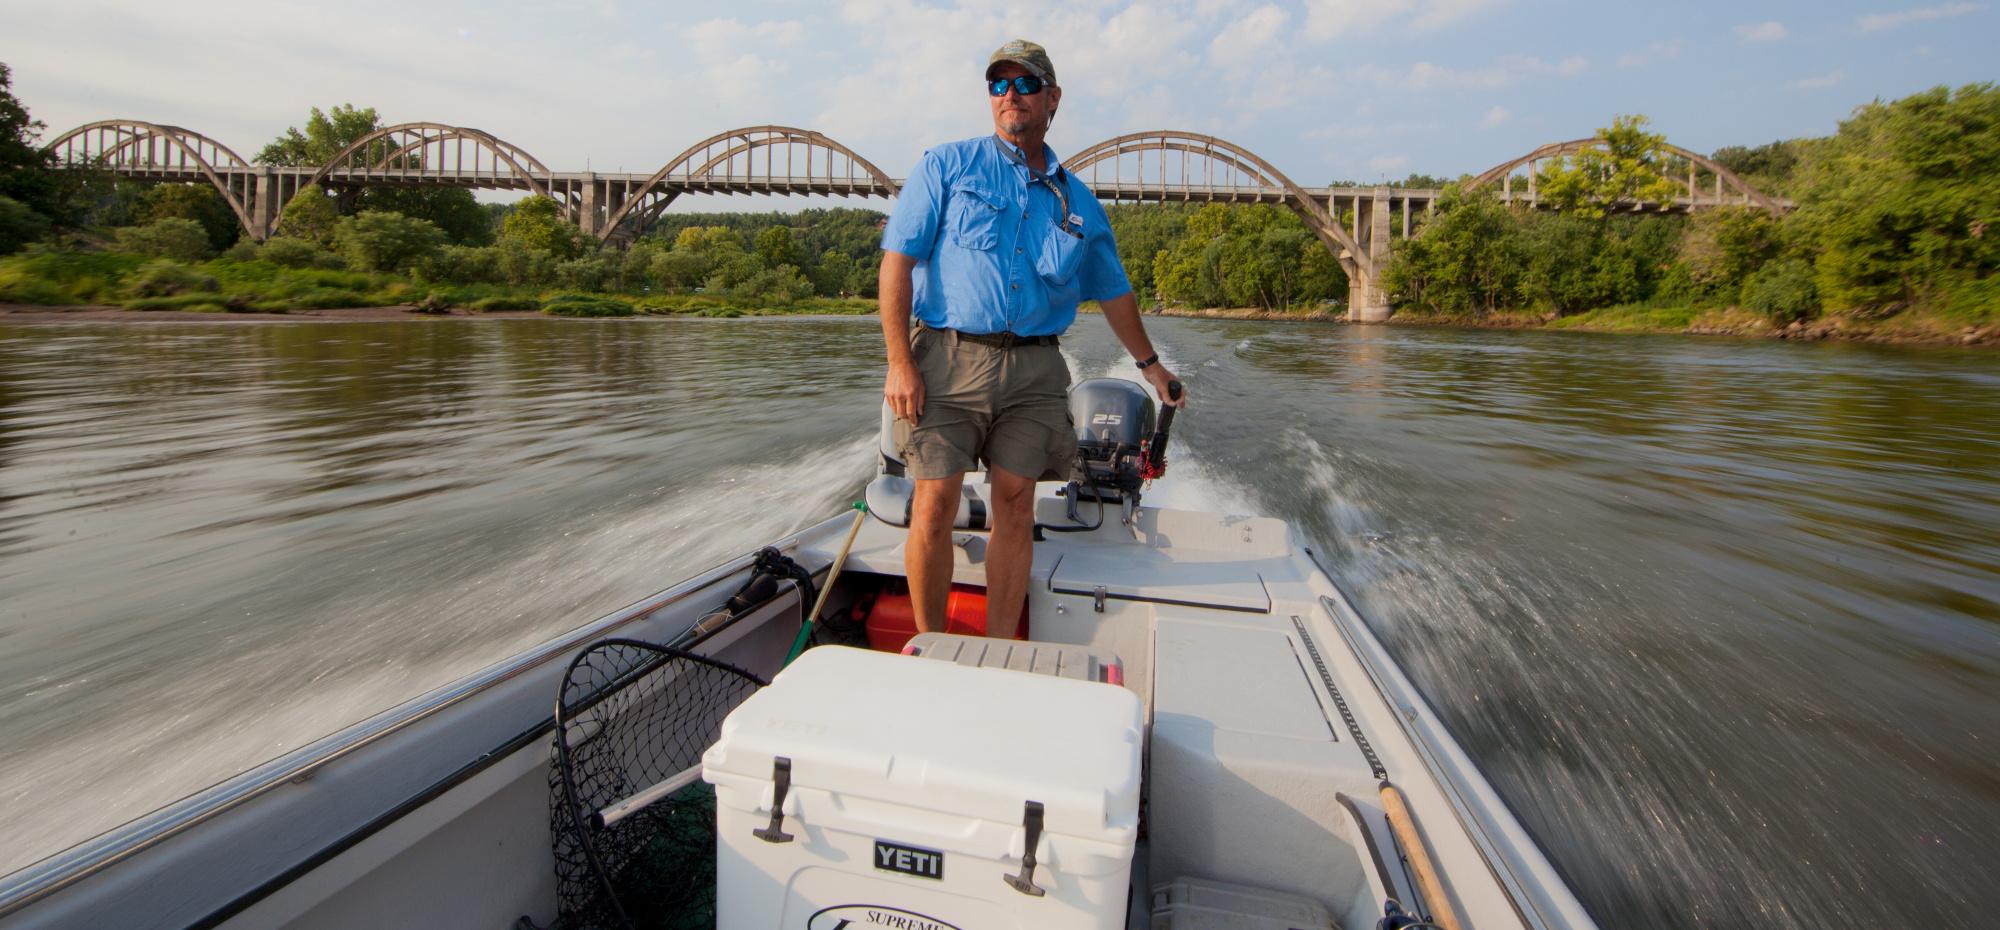 Shawnee, Supreme & Predator Boats